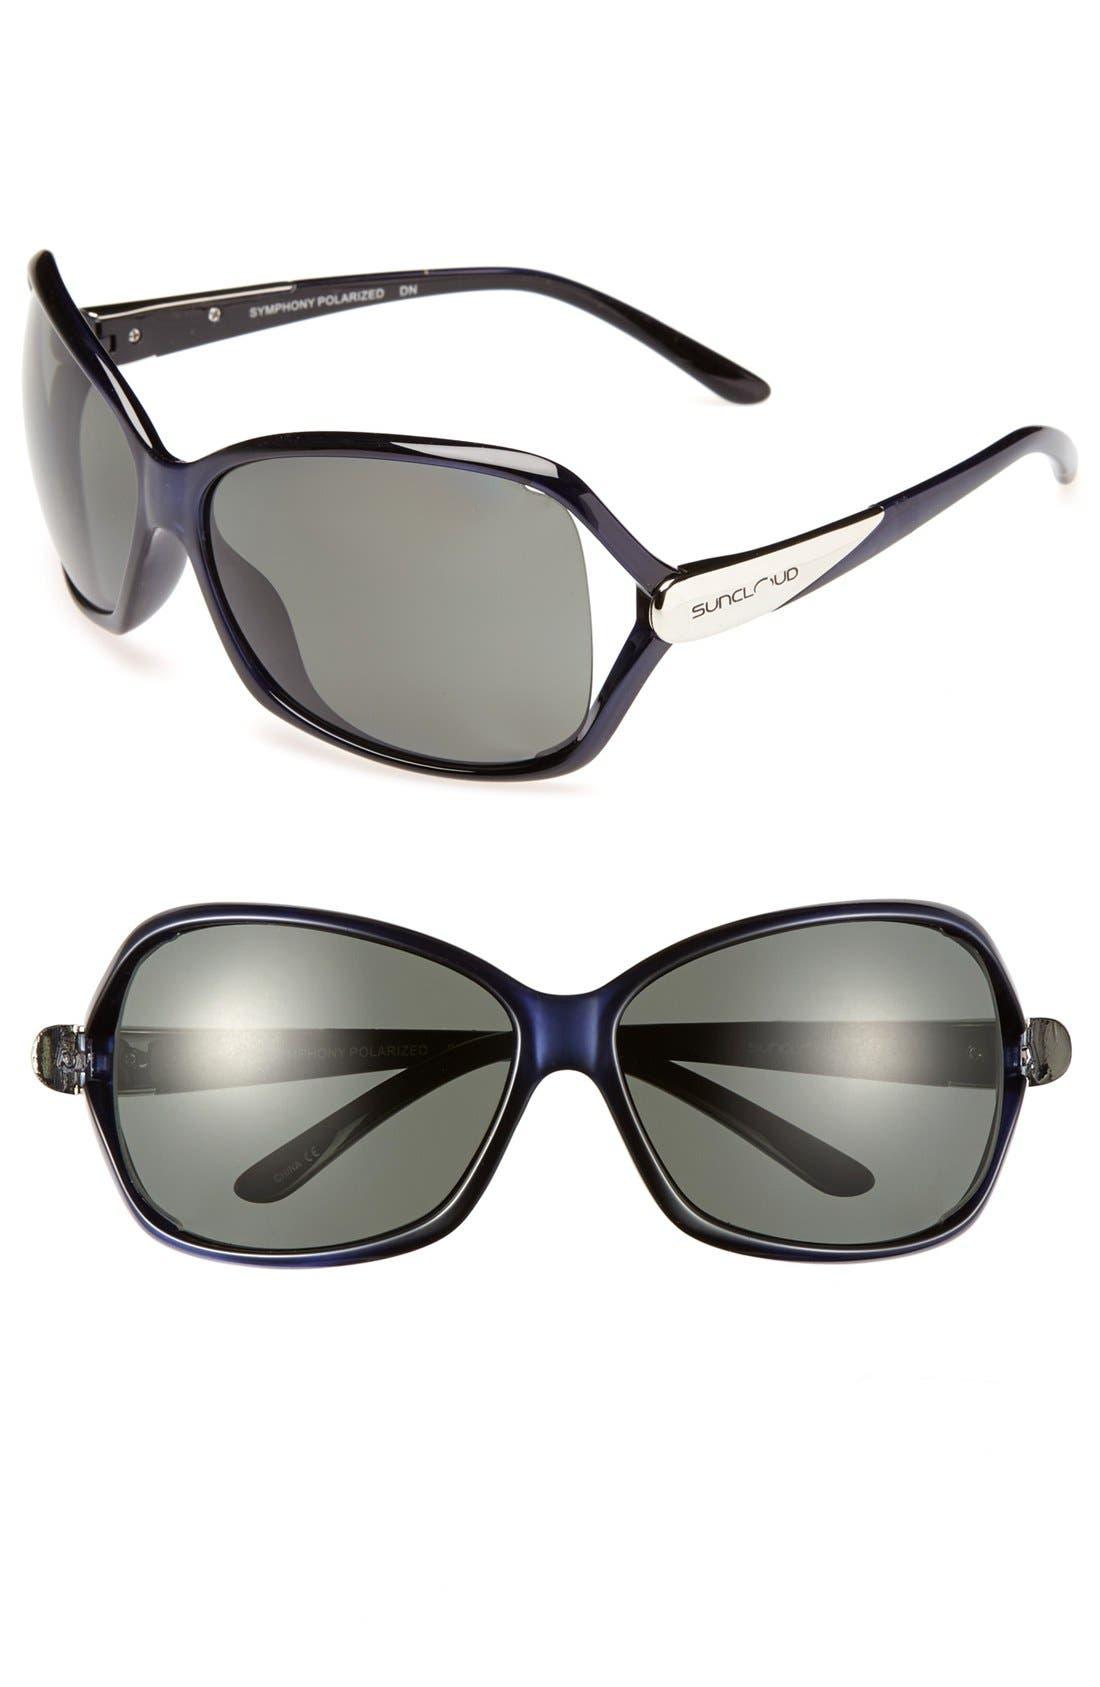 Main Image - Suncloud 'Symphony' Polarized Sunglasses